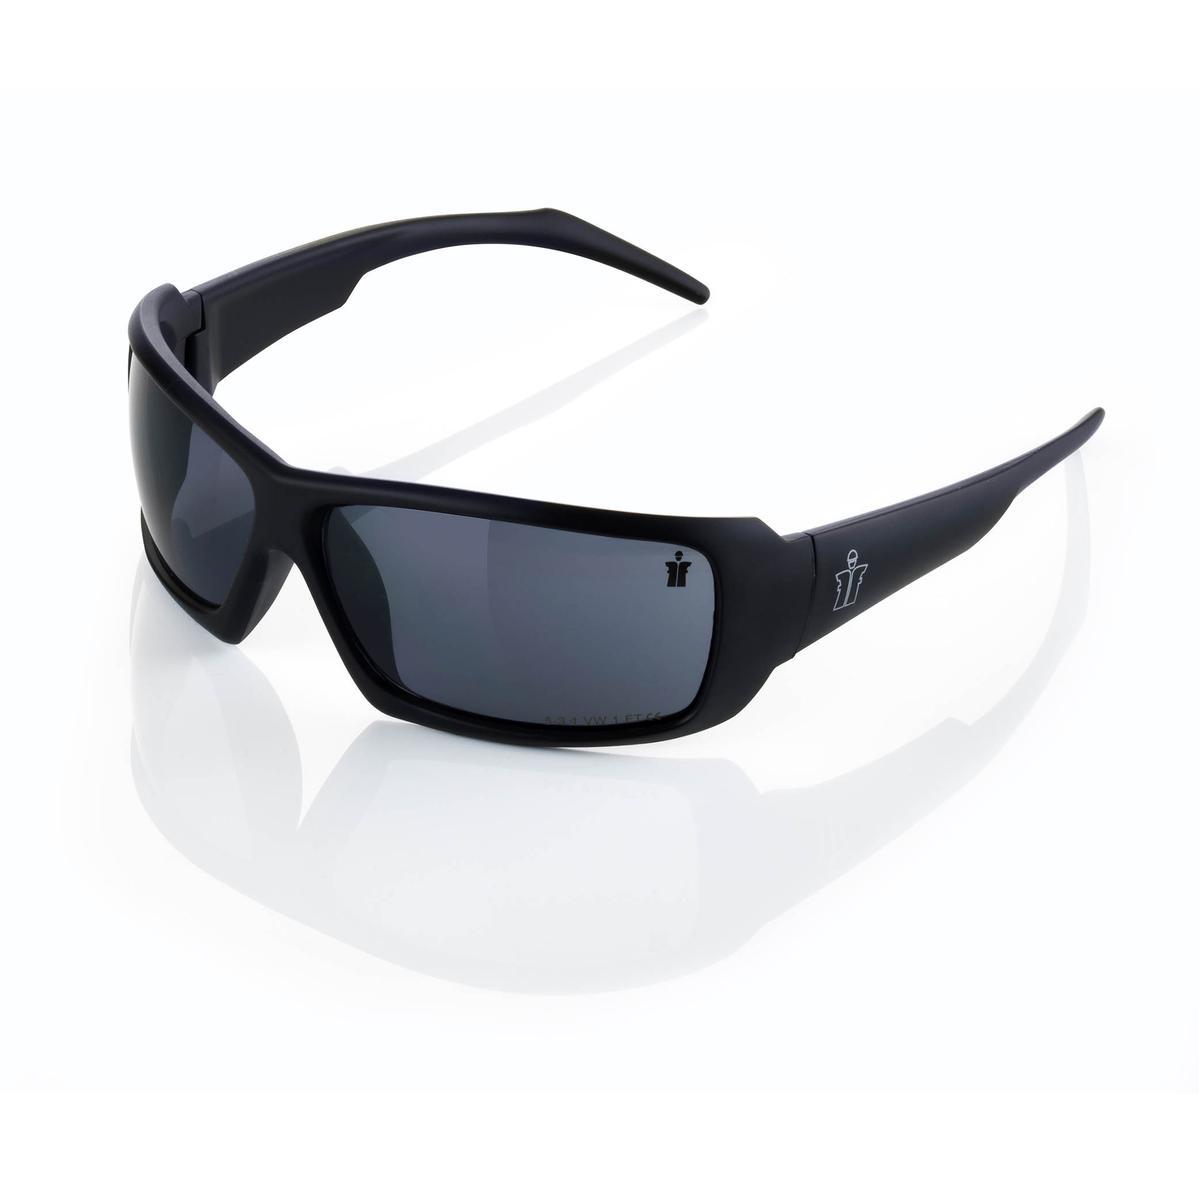 Image for Smoke Eagle Specs